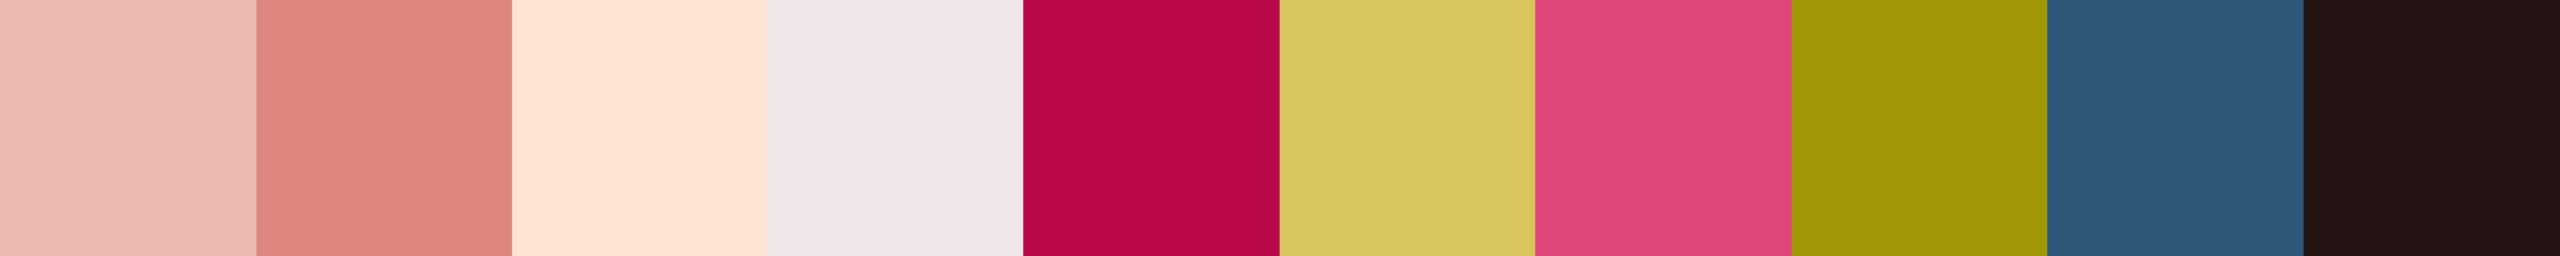 489 Optakria Color Palette